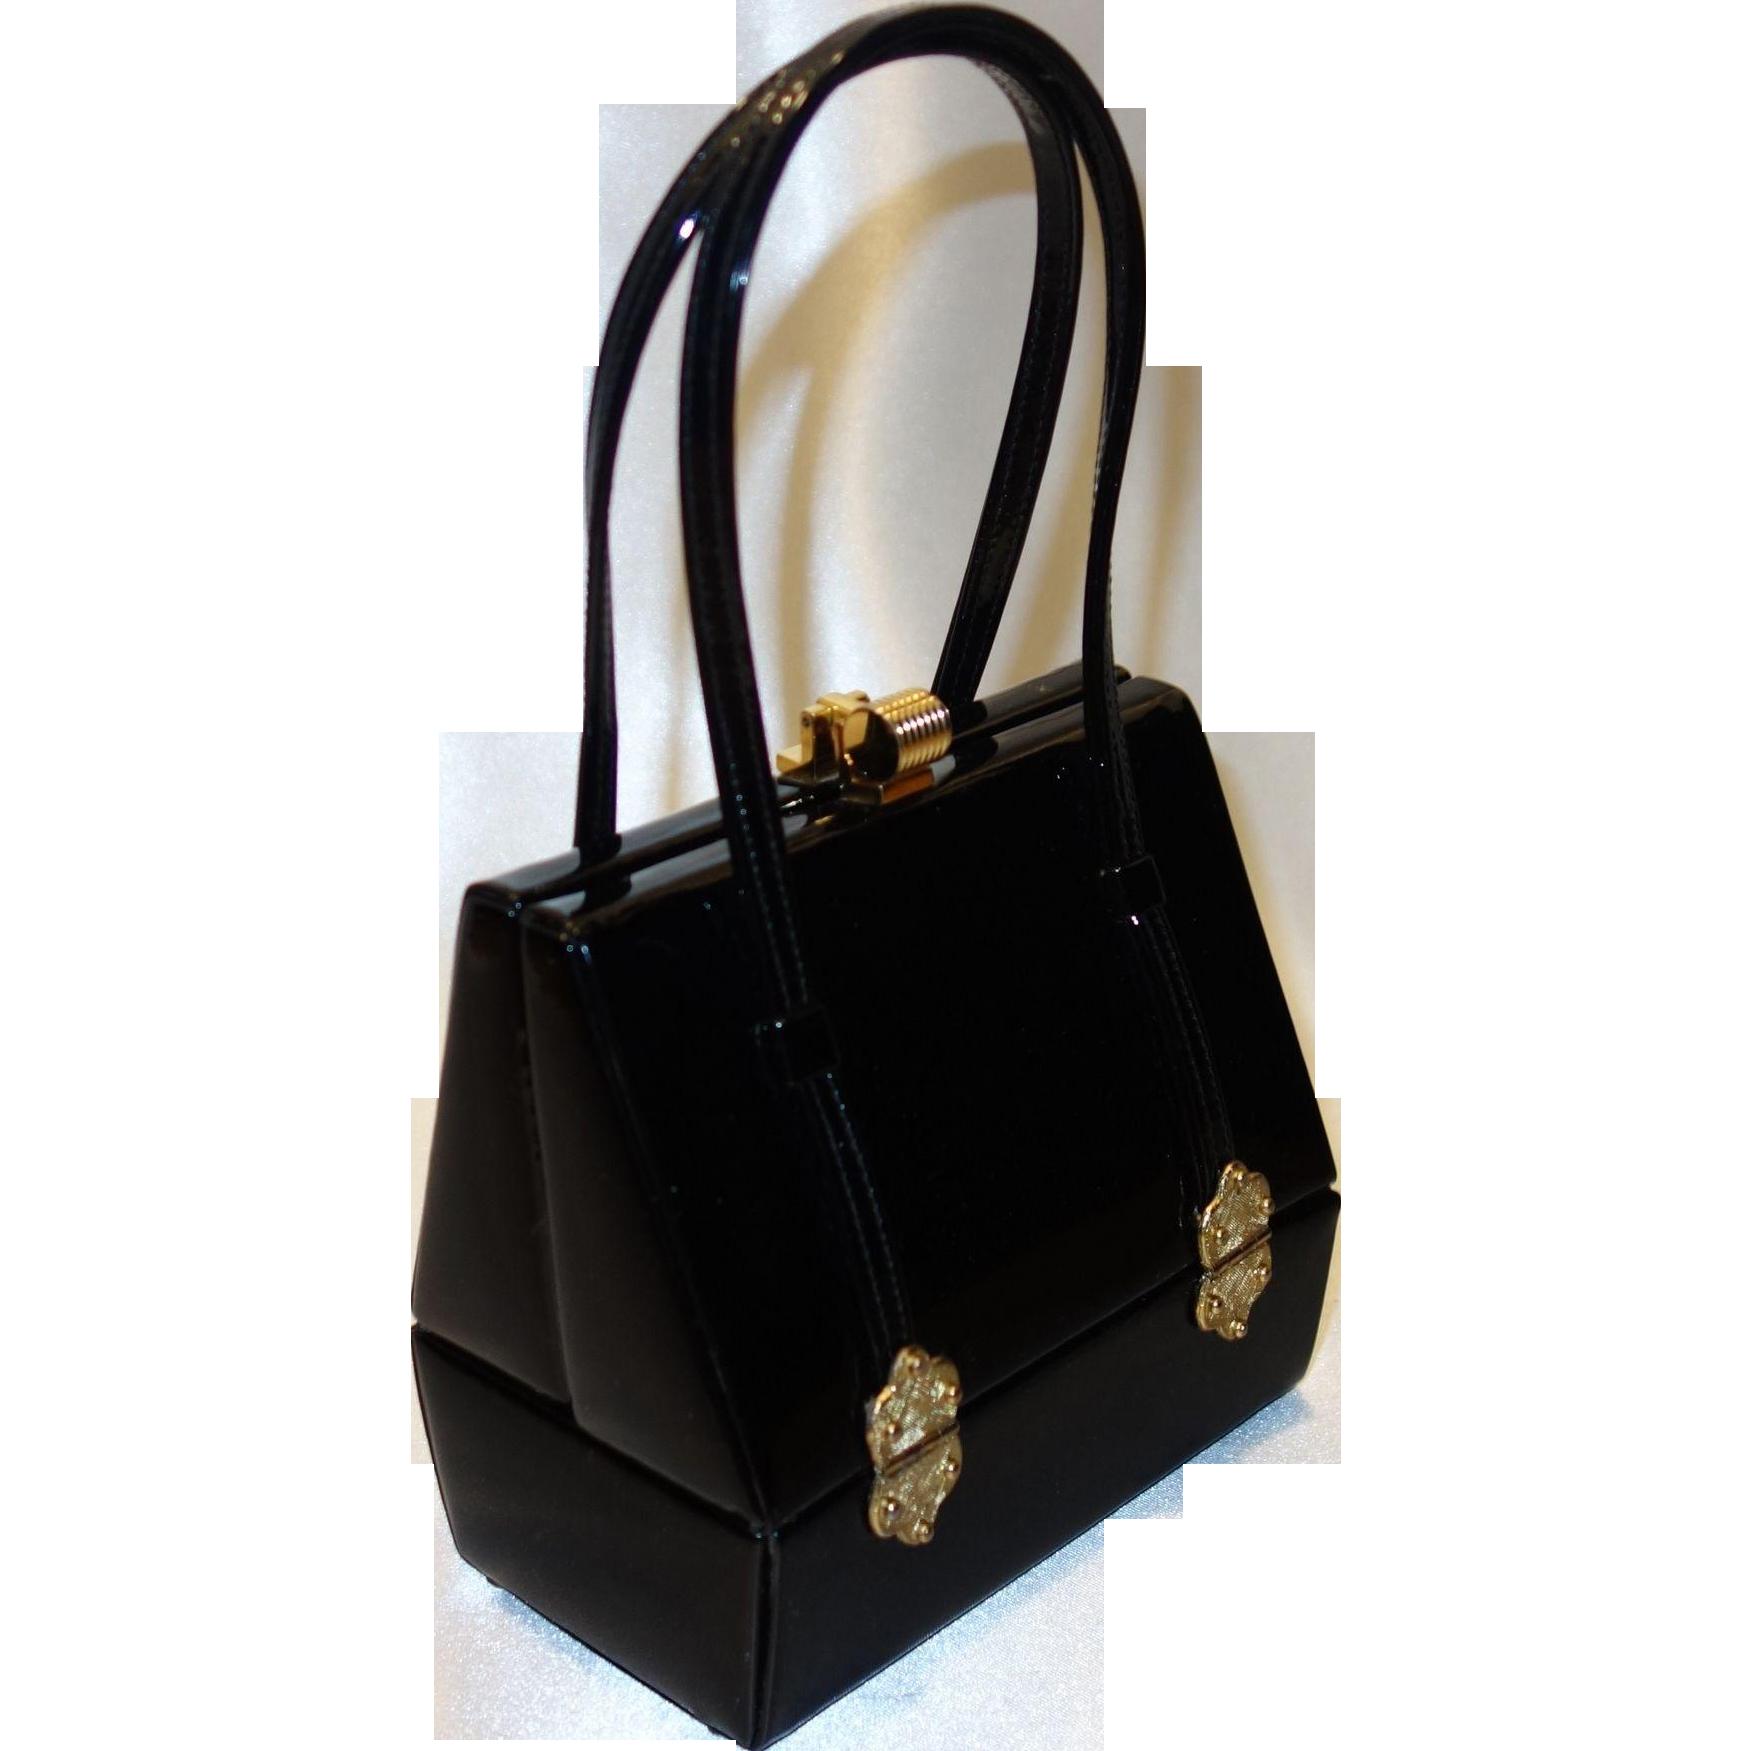 Elegant Fifties Black Patent Leather Platform Purse by Murray Kruger